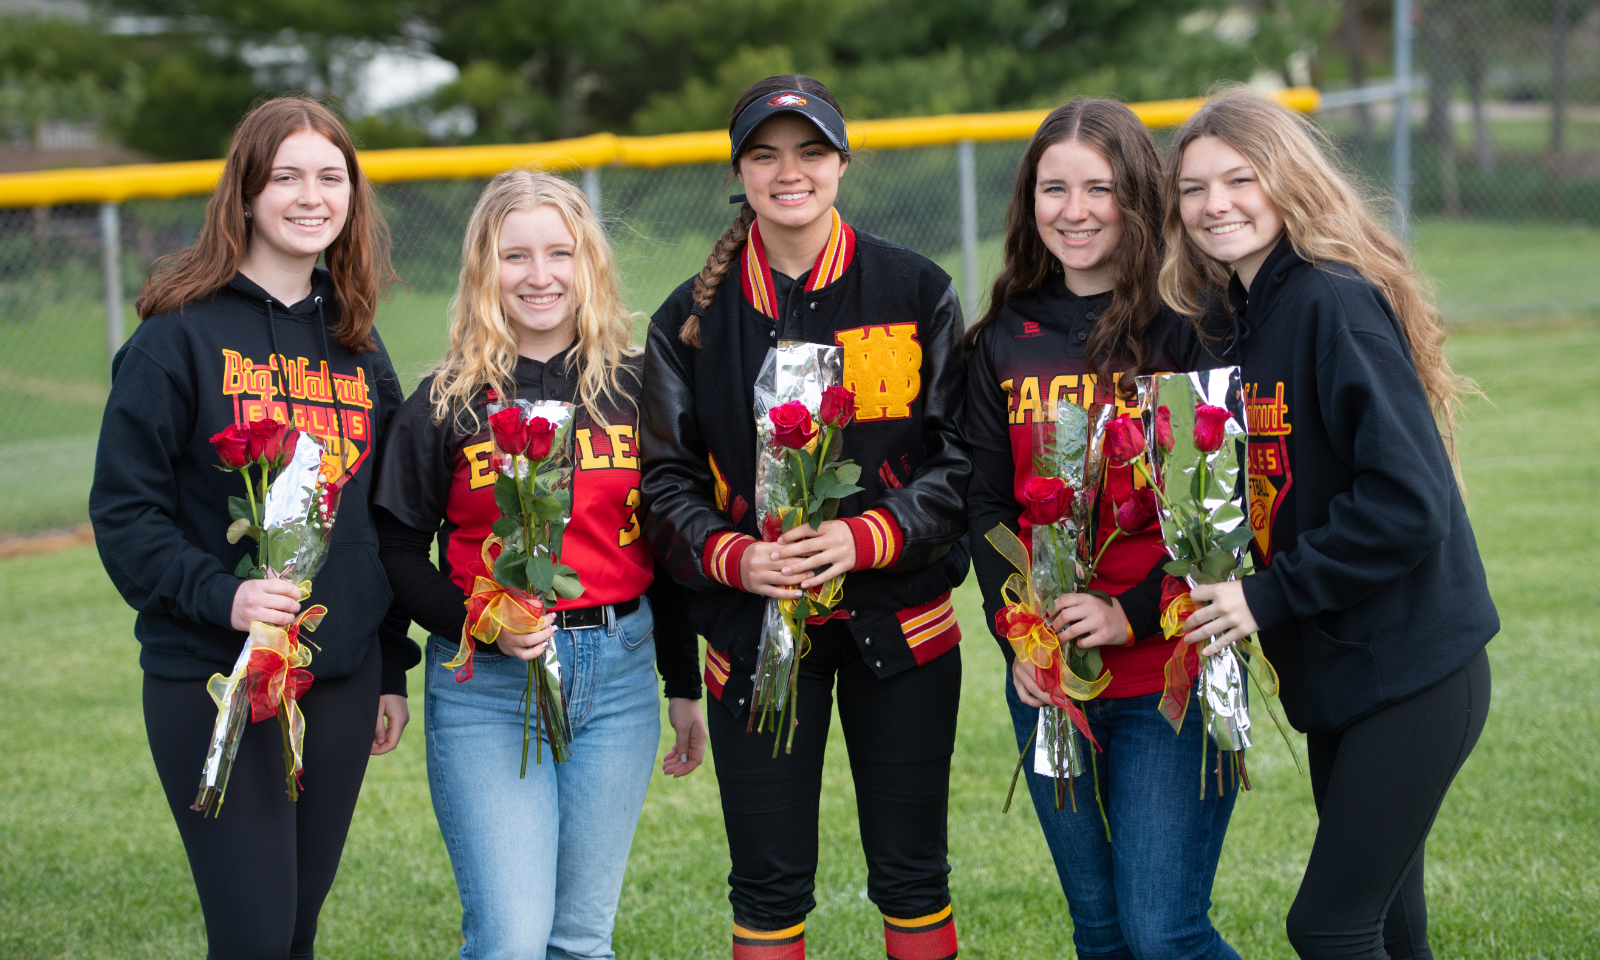 PHOTO GALLERY: Big Walnut recognizes softball seniors